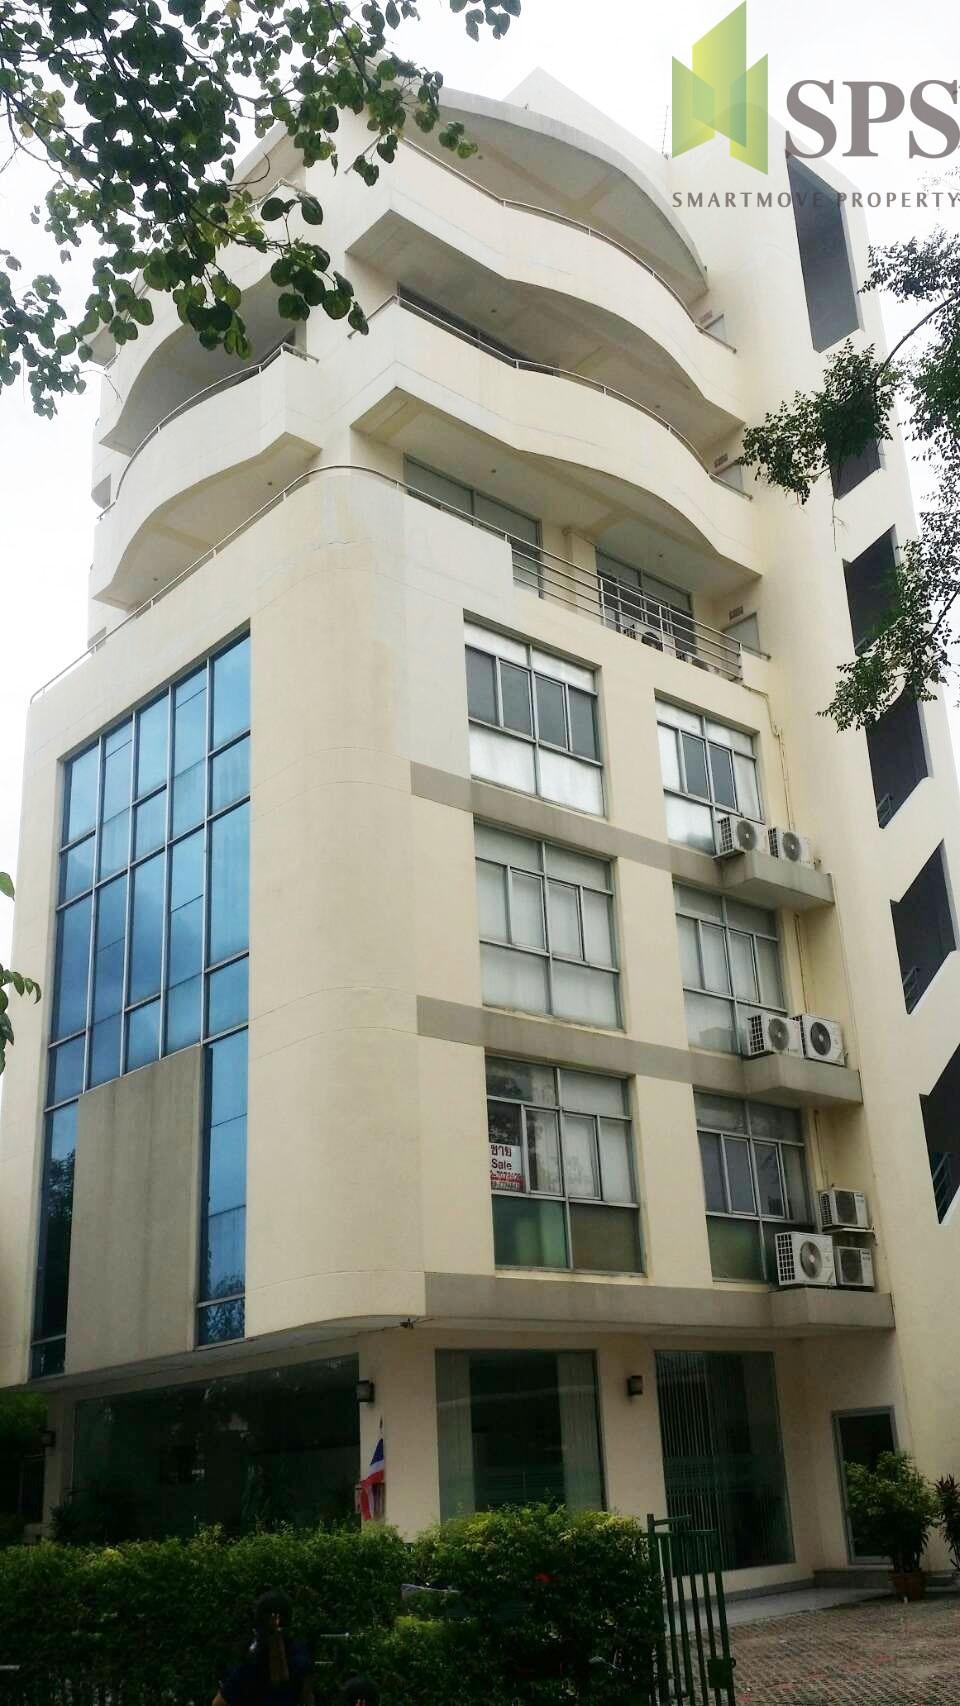 Office Building for Rent Srinakarin – อาคารสำนักงานให้เช่าทั้งตึก ตรงข้ามซีคอนสแควร์ ศรีนครินทร์ ( SPSPE263)